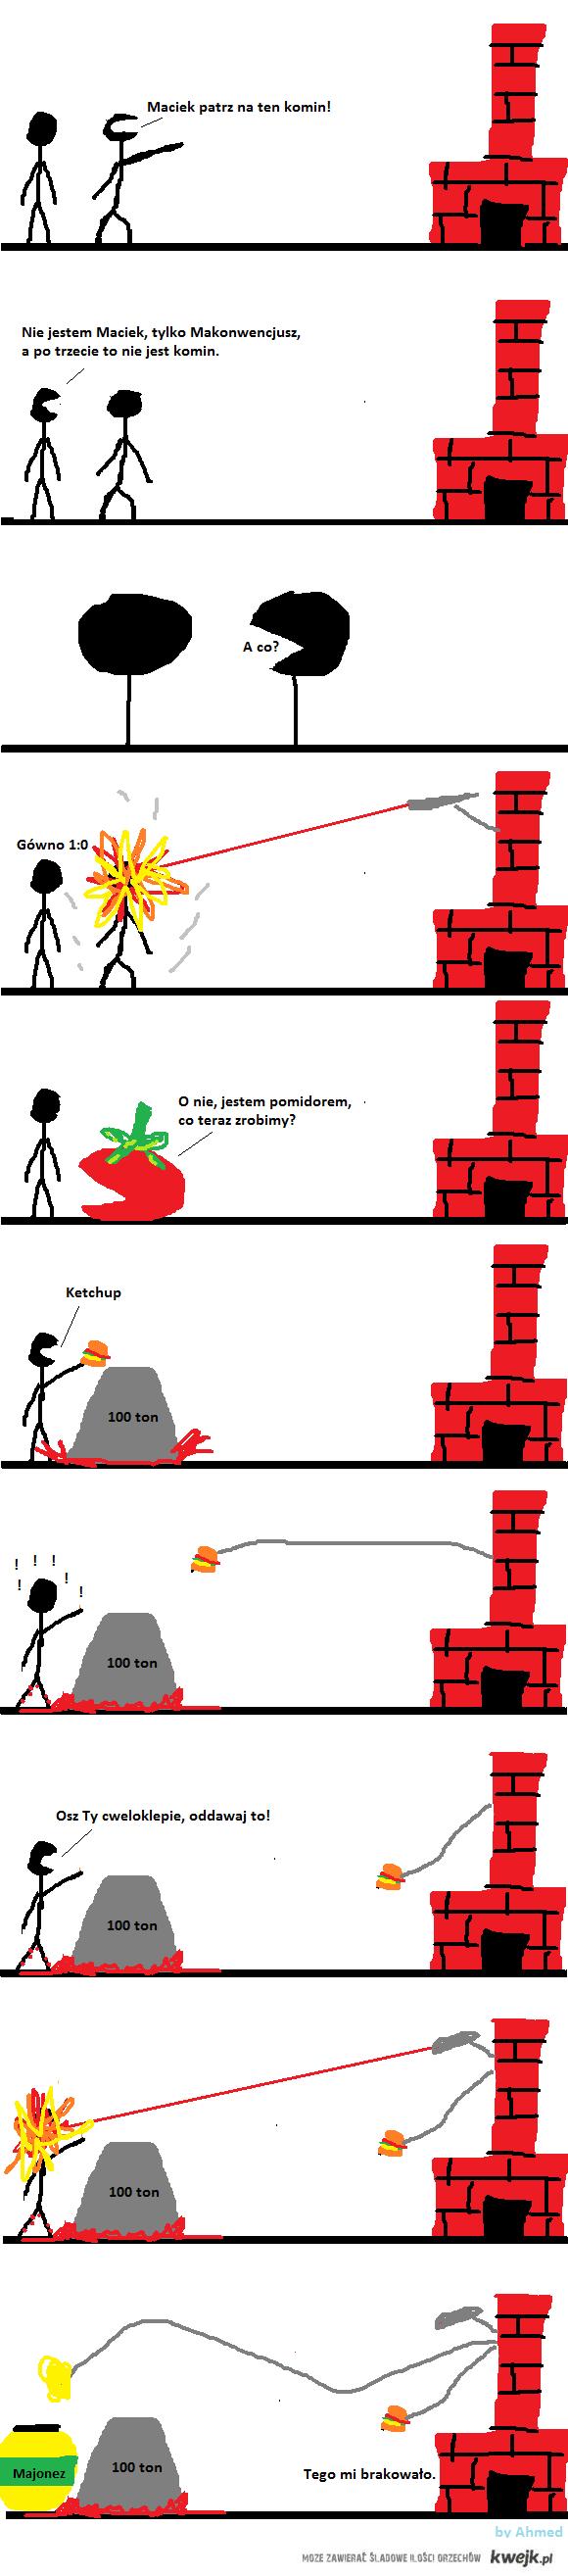 Komin - historia prawdziwa